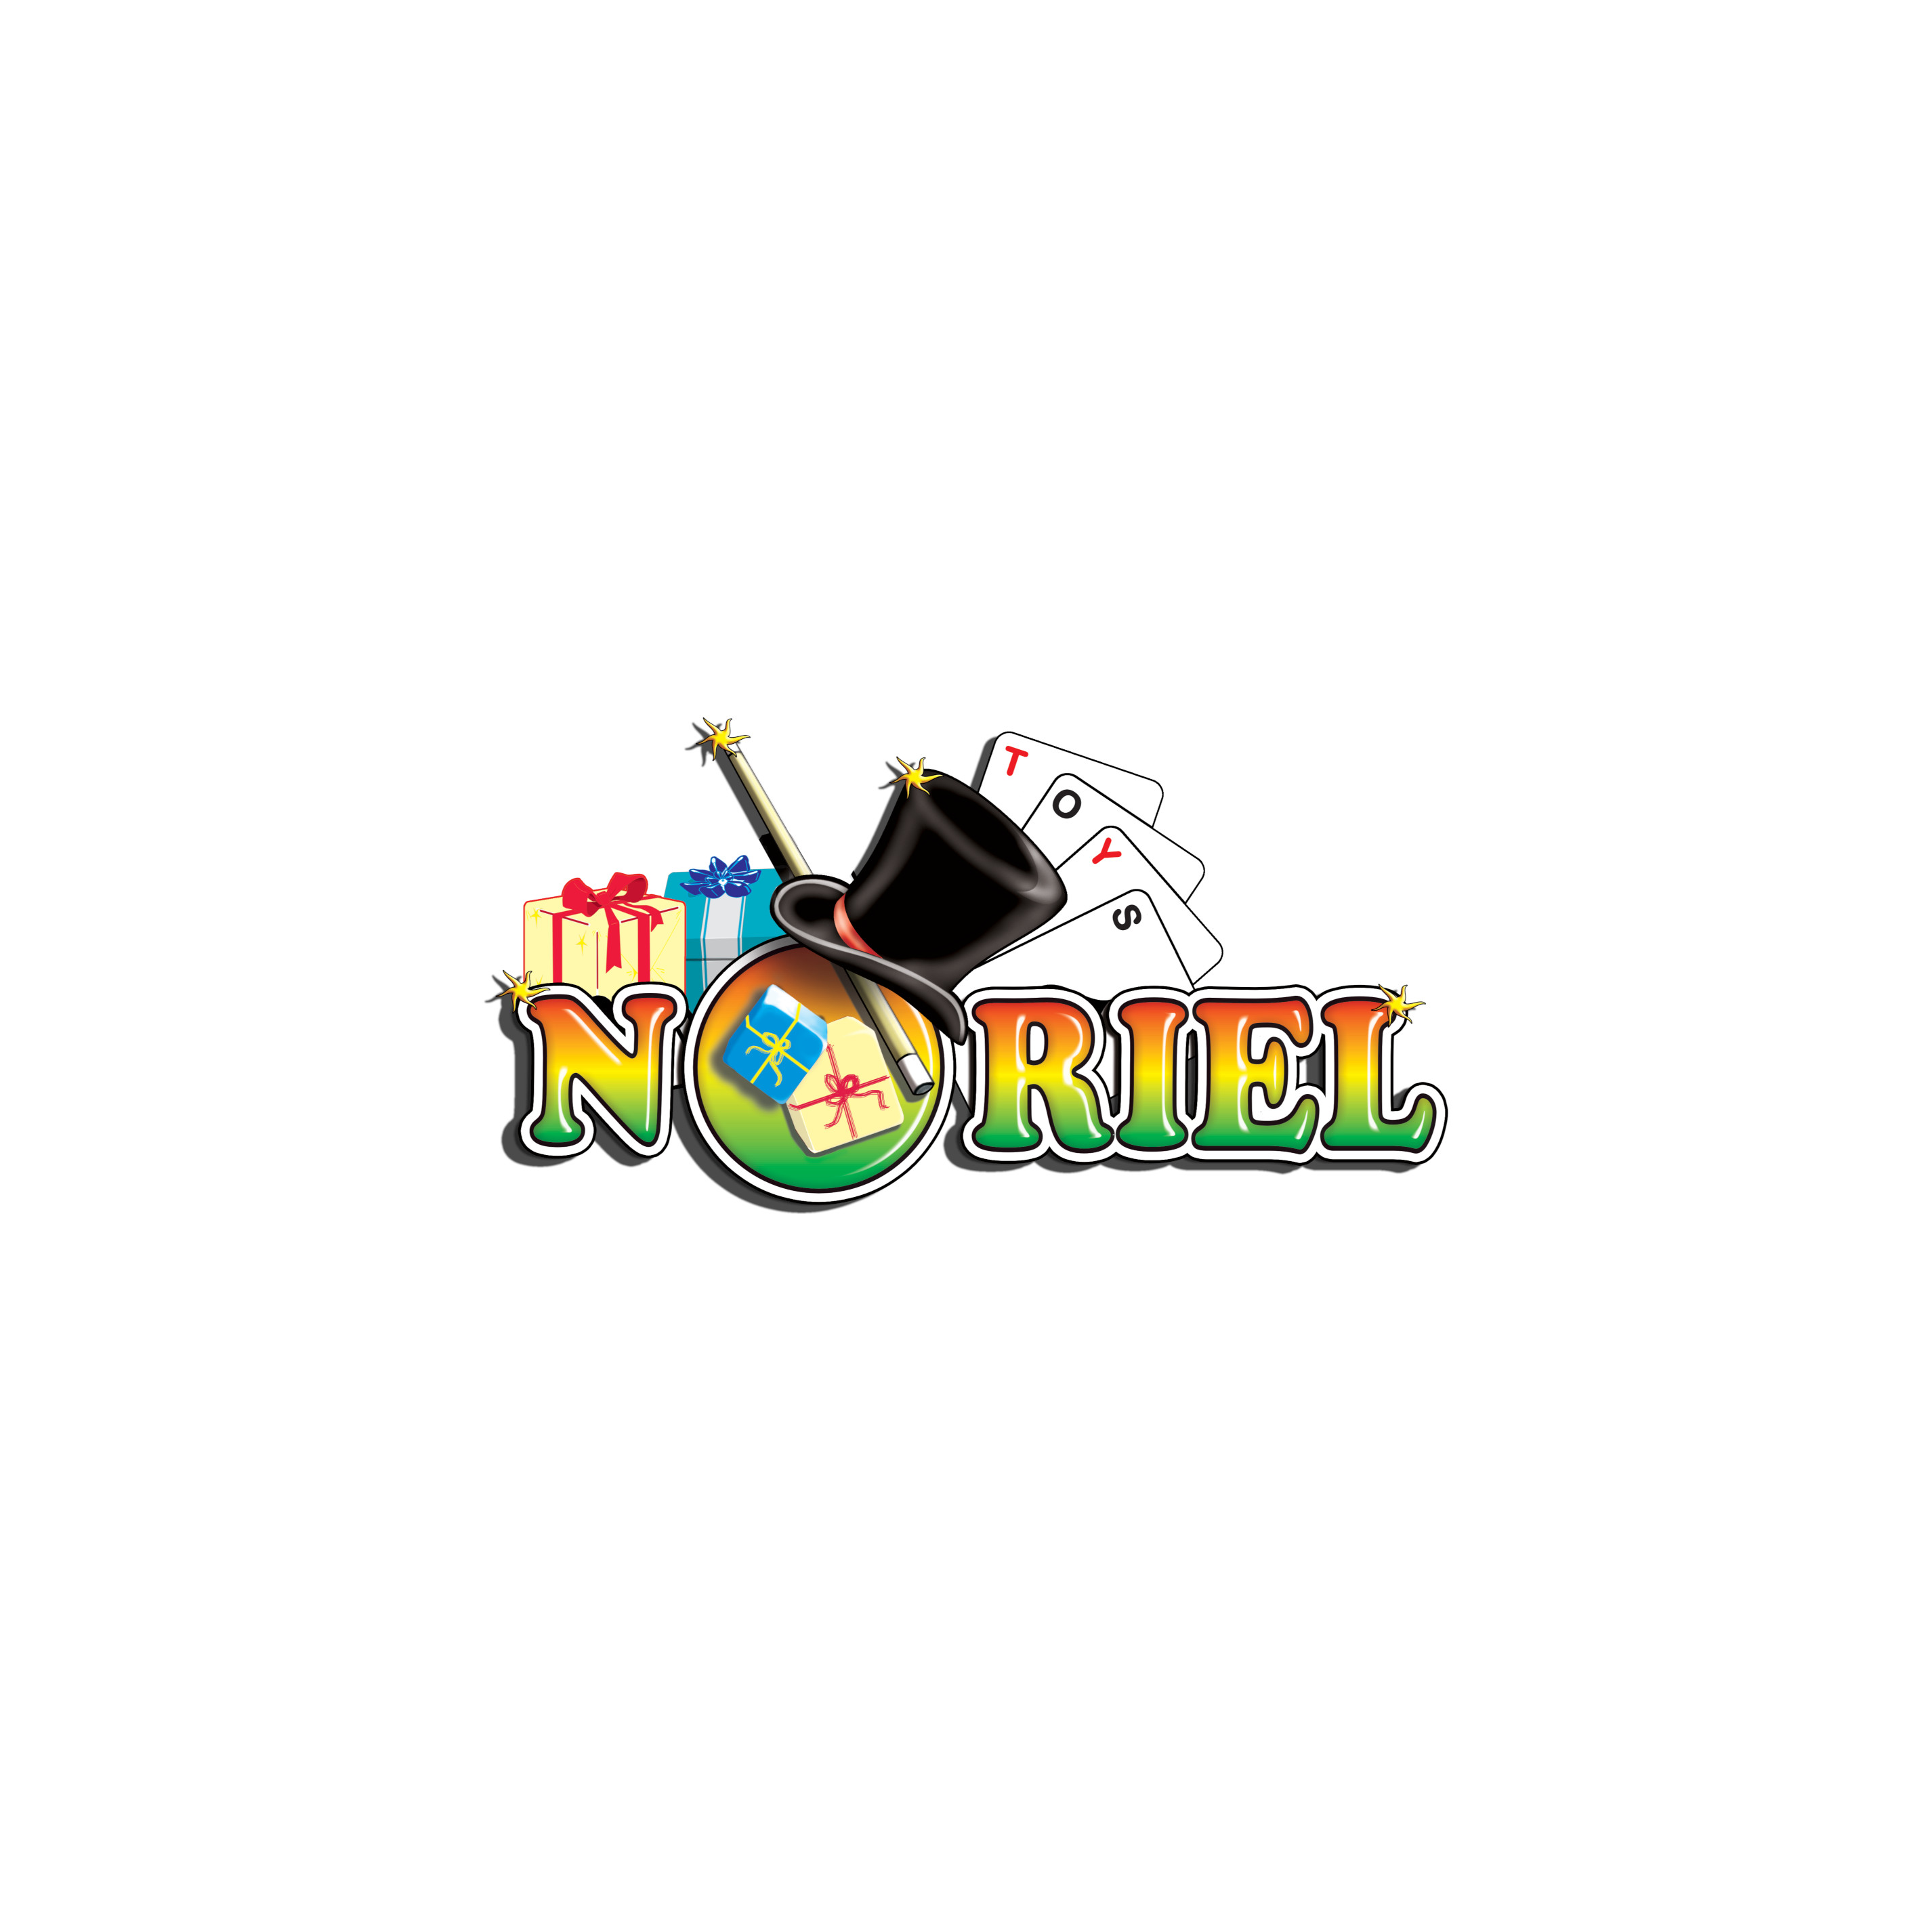 Set de constructie Playmobil Country - Ferma mare cu padoc (5221)